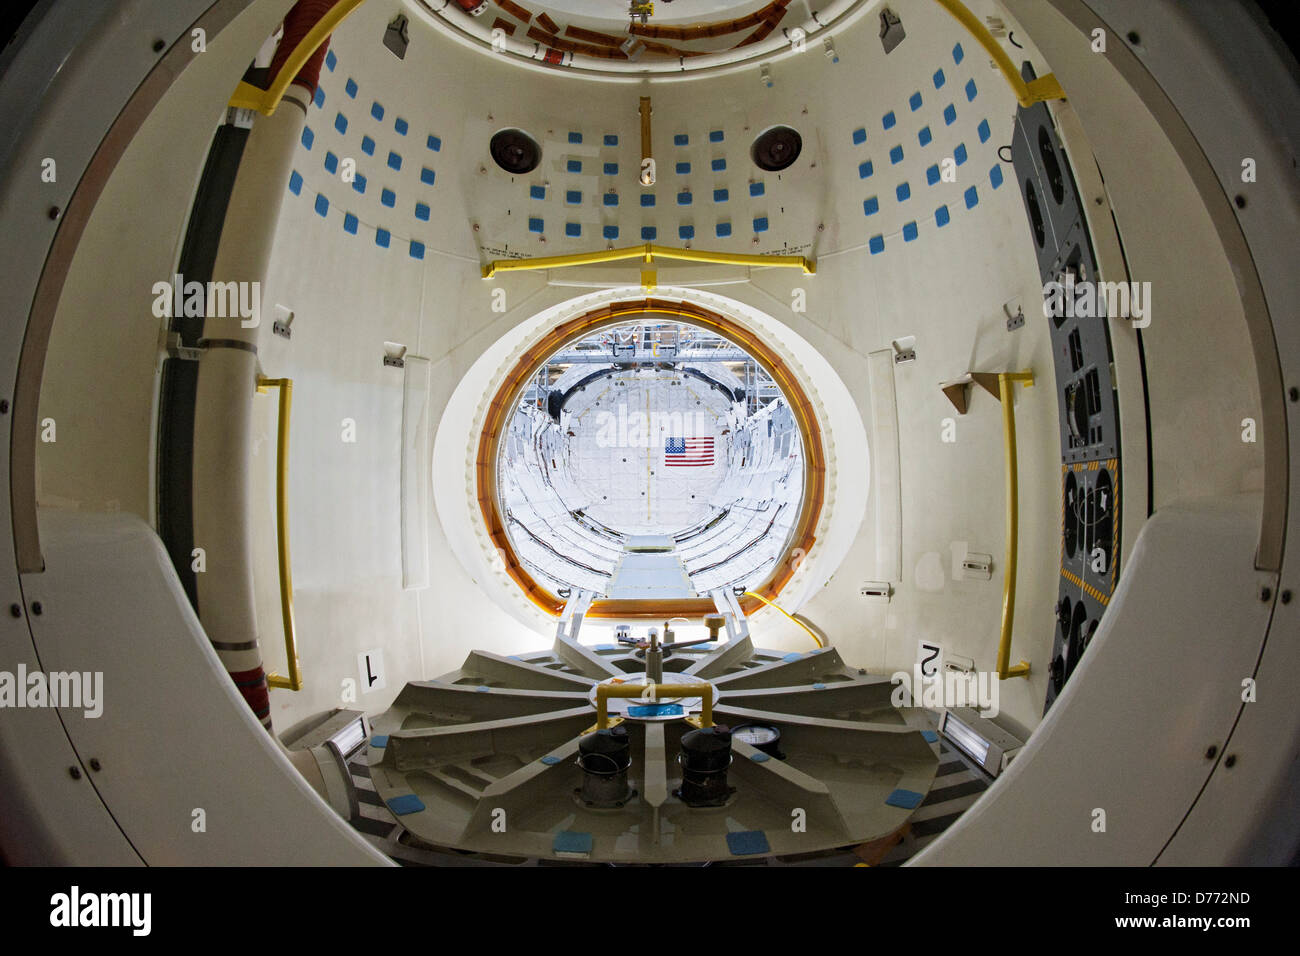 space shuttle b. hatch - photo #18